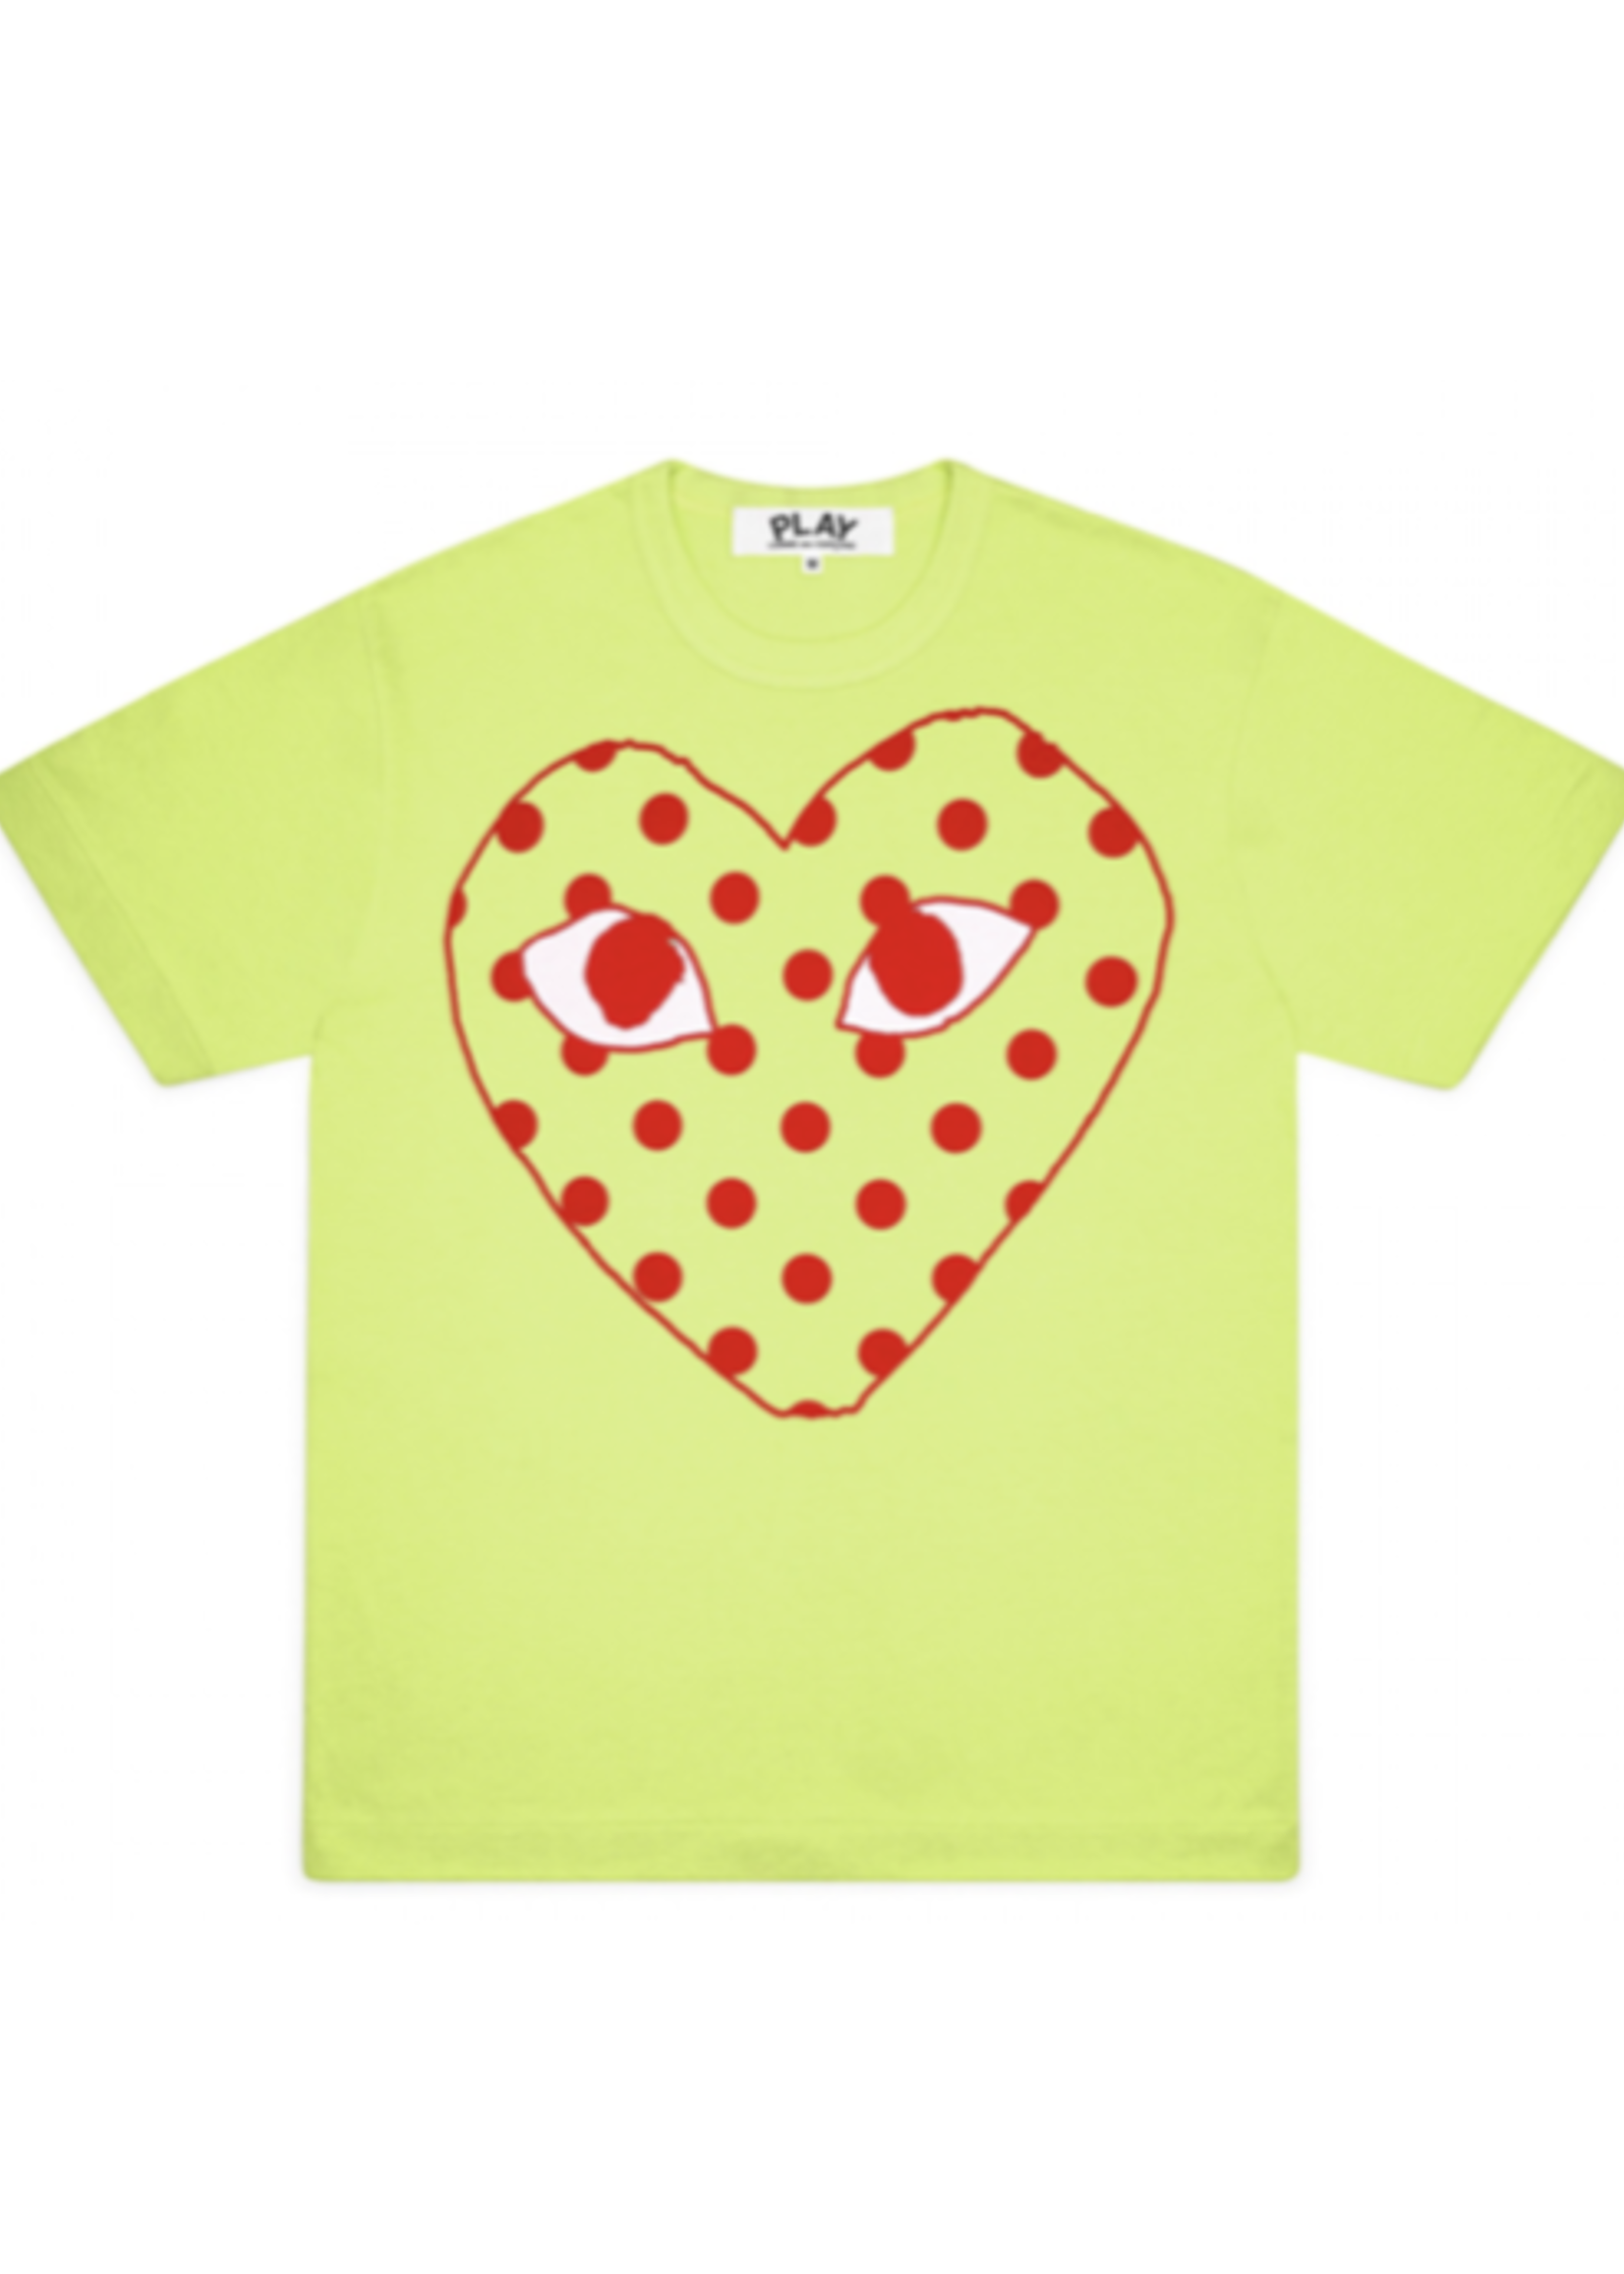 COMME des GARÇONS PLAY Comme des Garçons PLAY Womens Neon Green Polka Dot Heart Tee